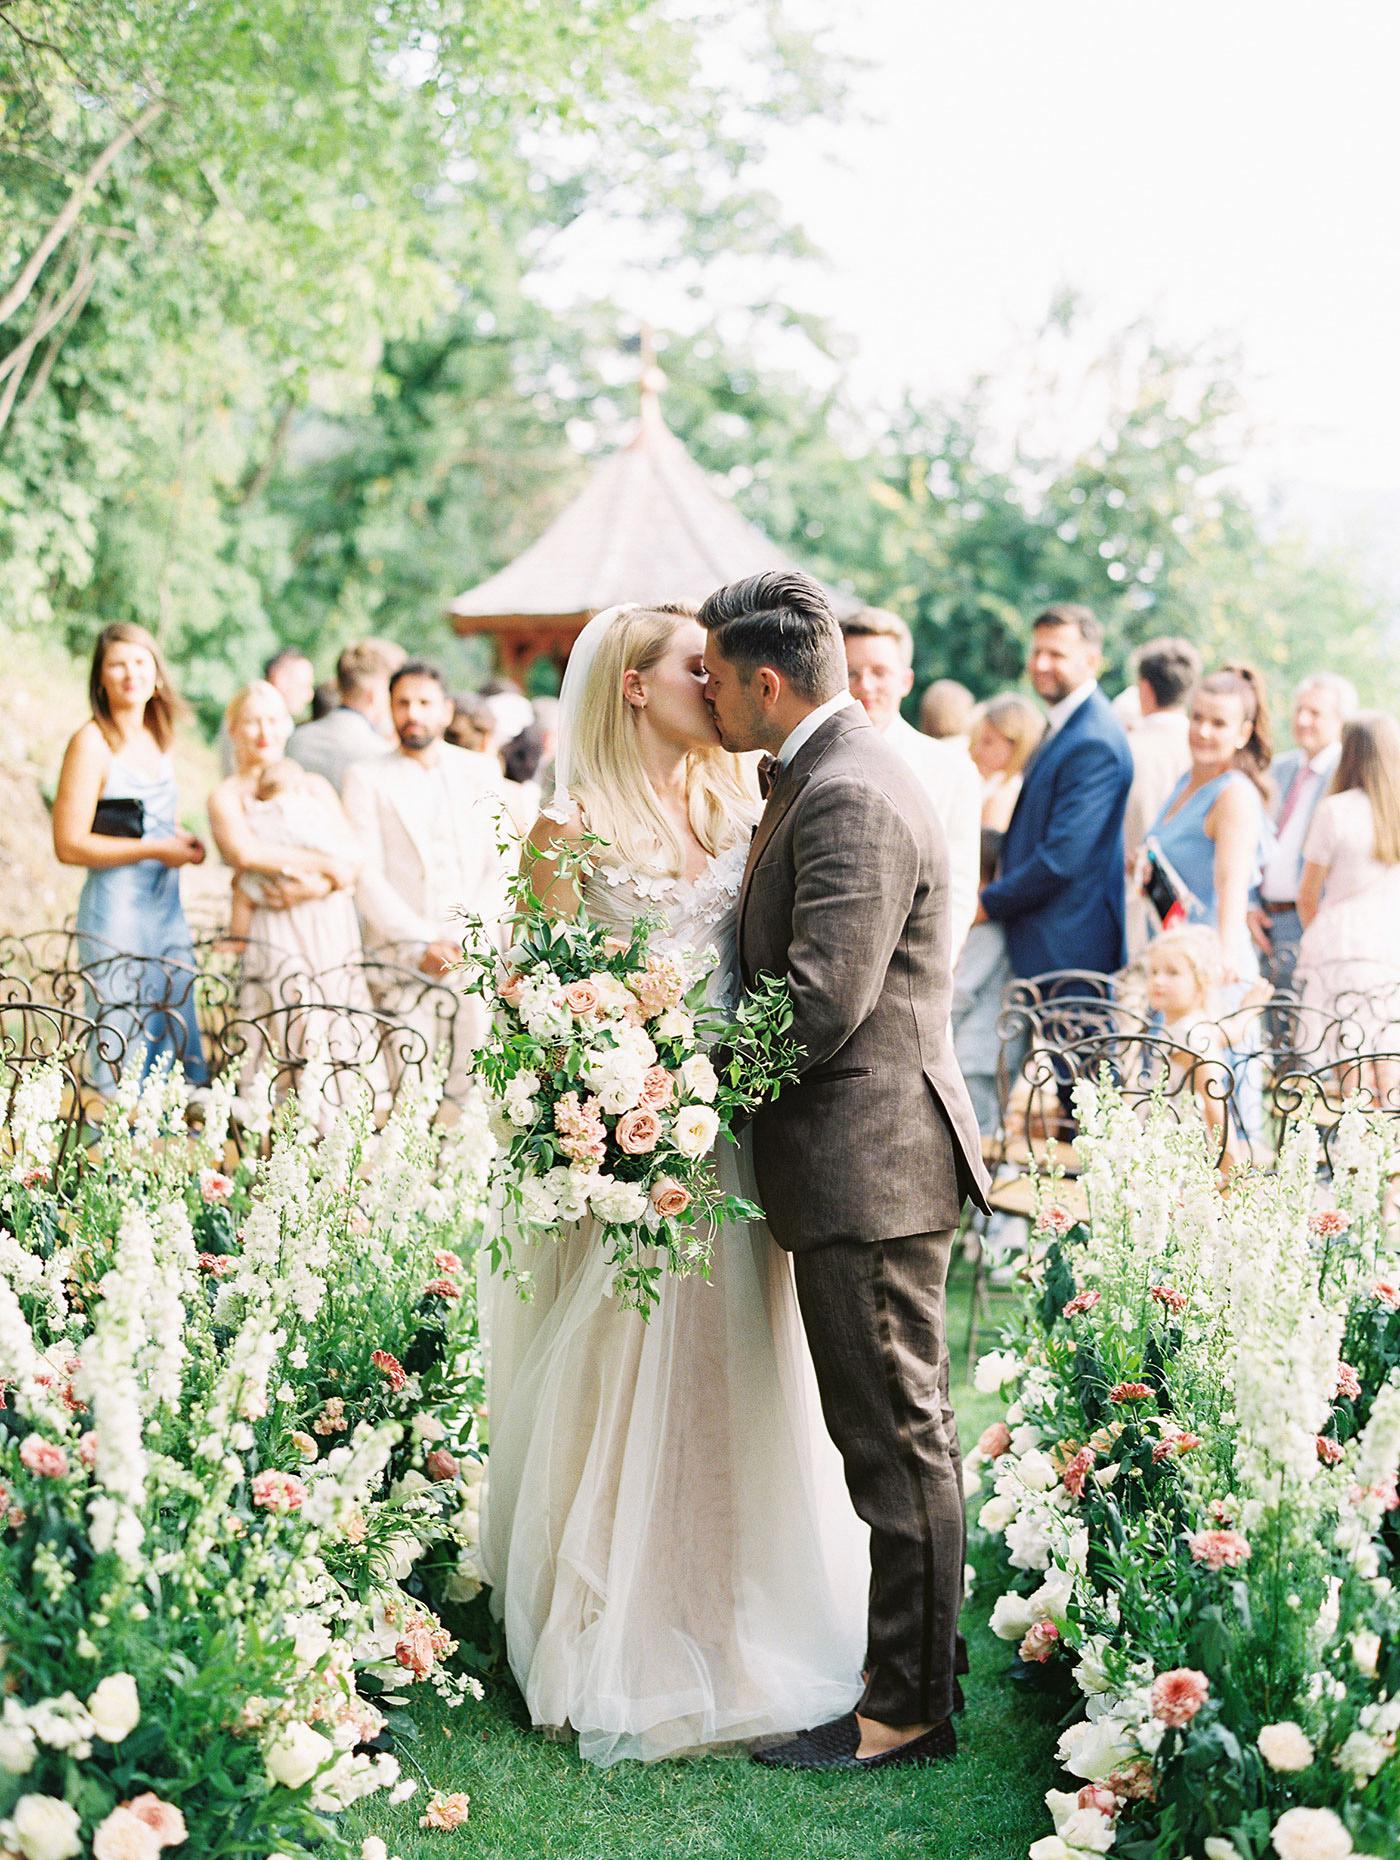 julia franz wedding couple kiss